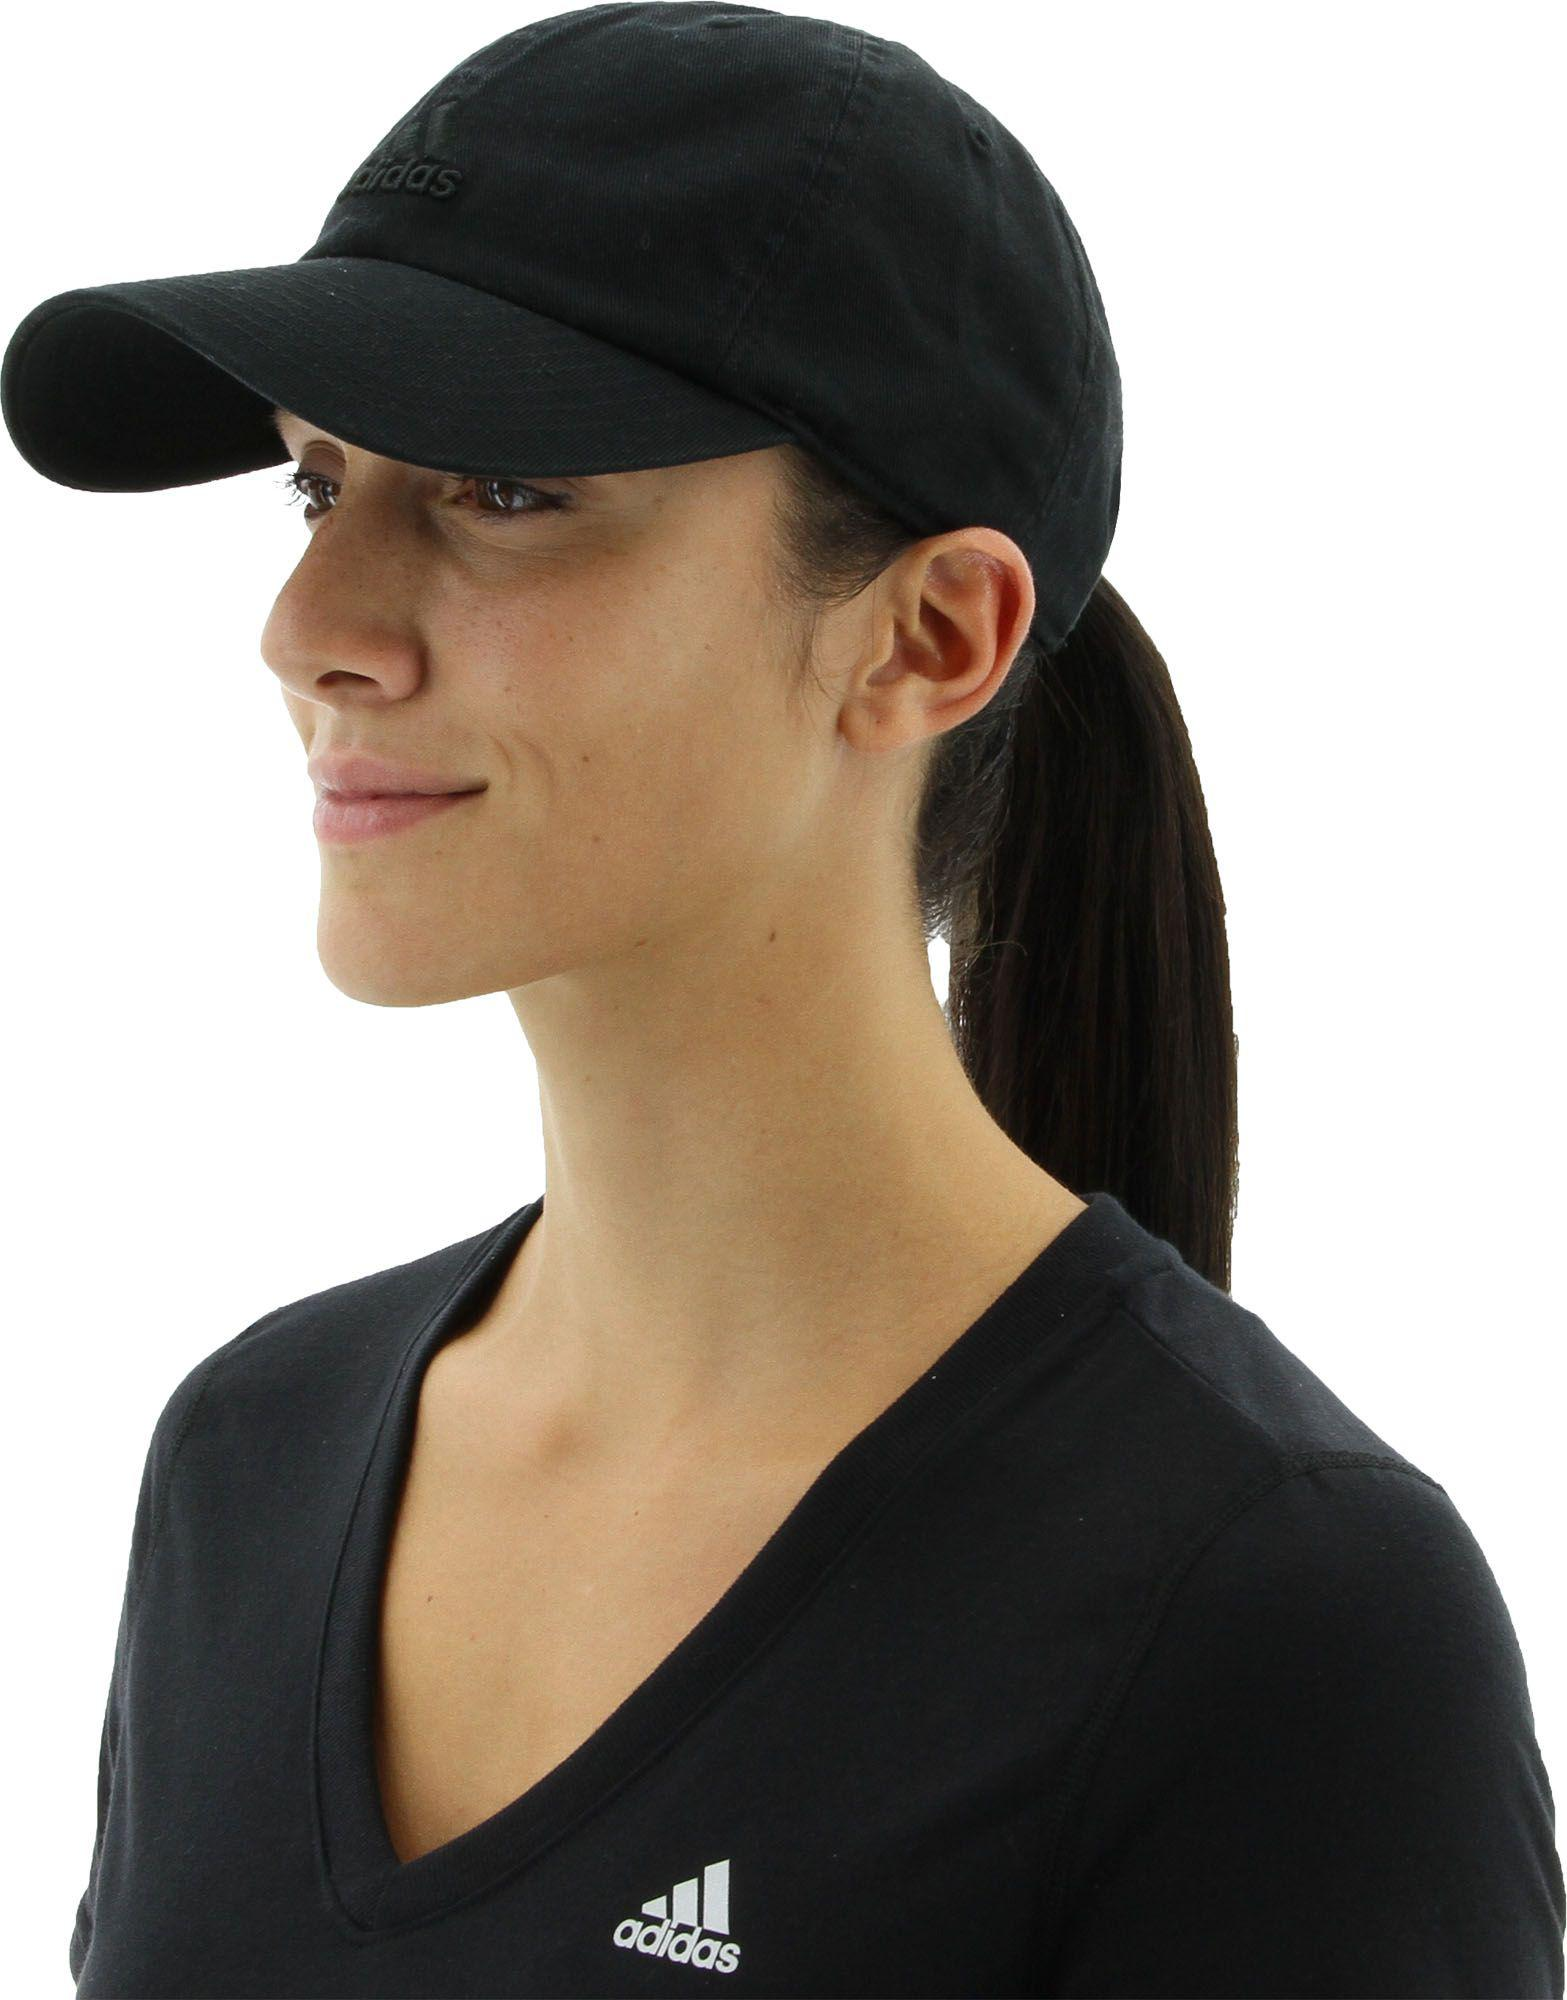 Lyst - adidas Saturday Hat in Black 69687e1d78d7